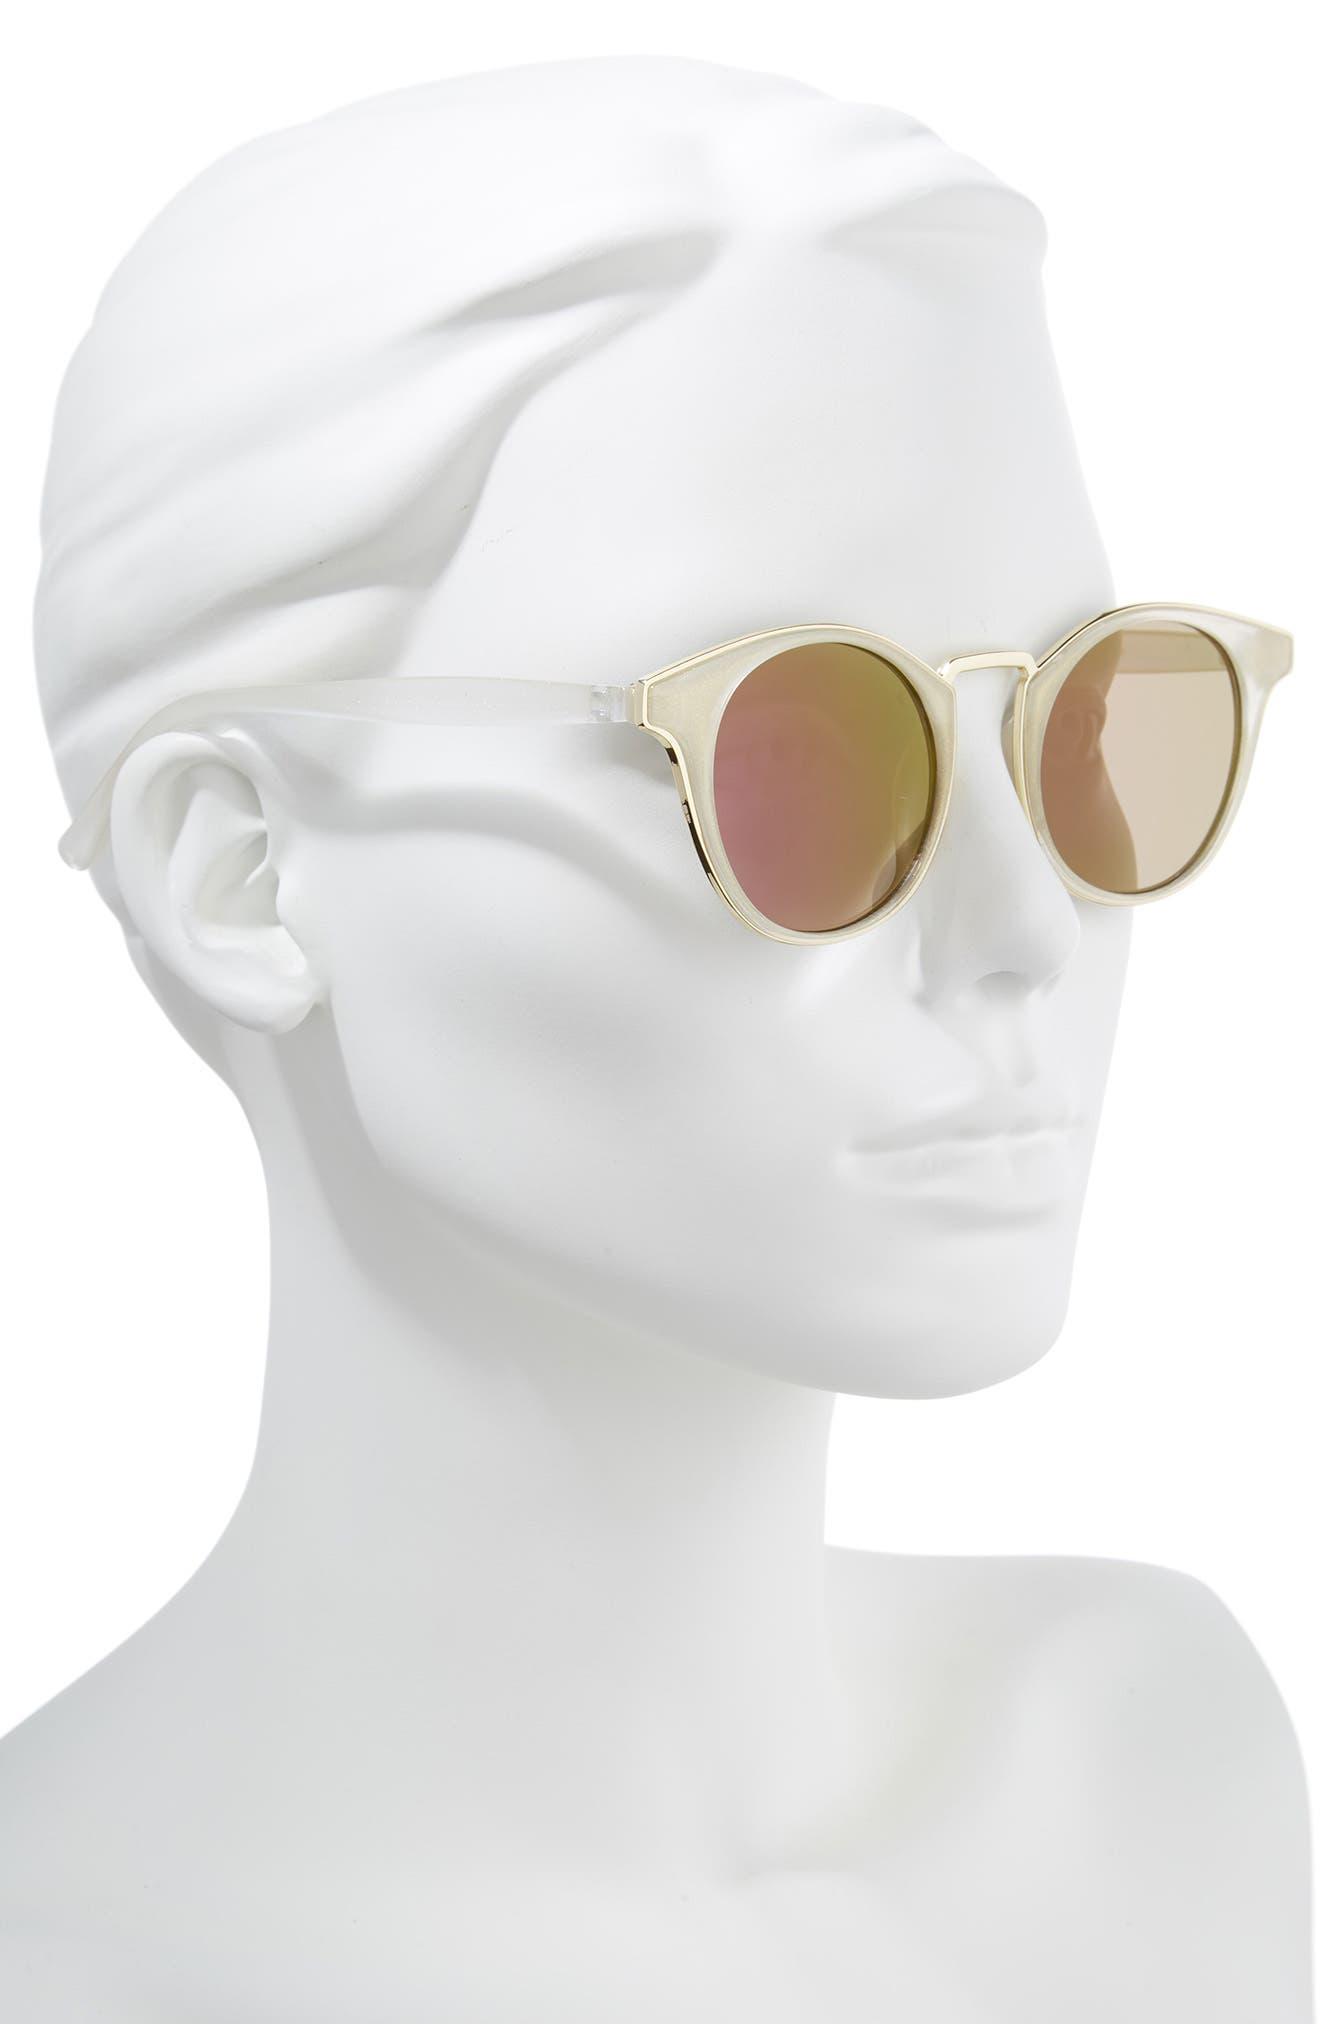 47mm Metal Trim Round Sunglasses,                             Alternate thumbnail 2, color,                             Clear/ Blue